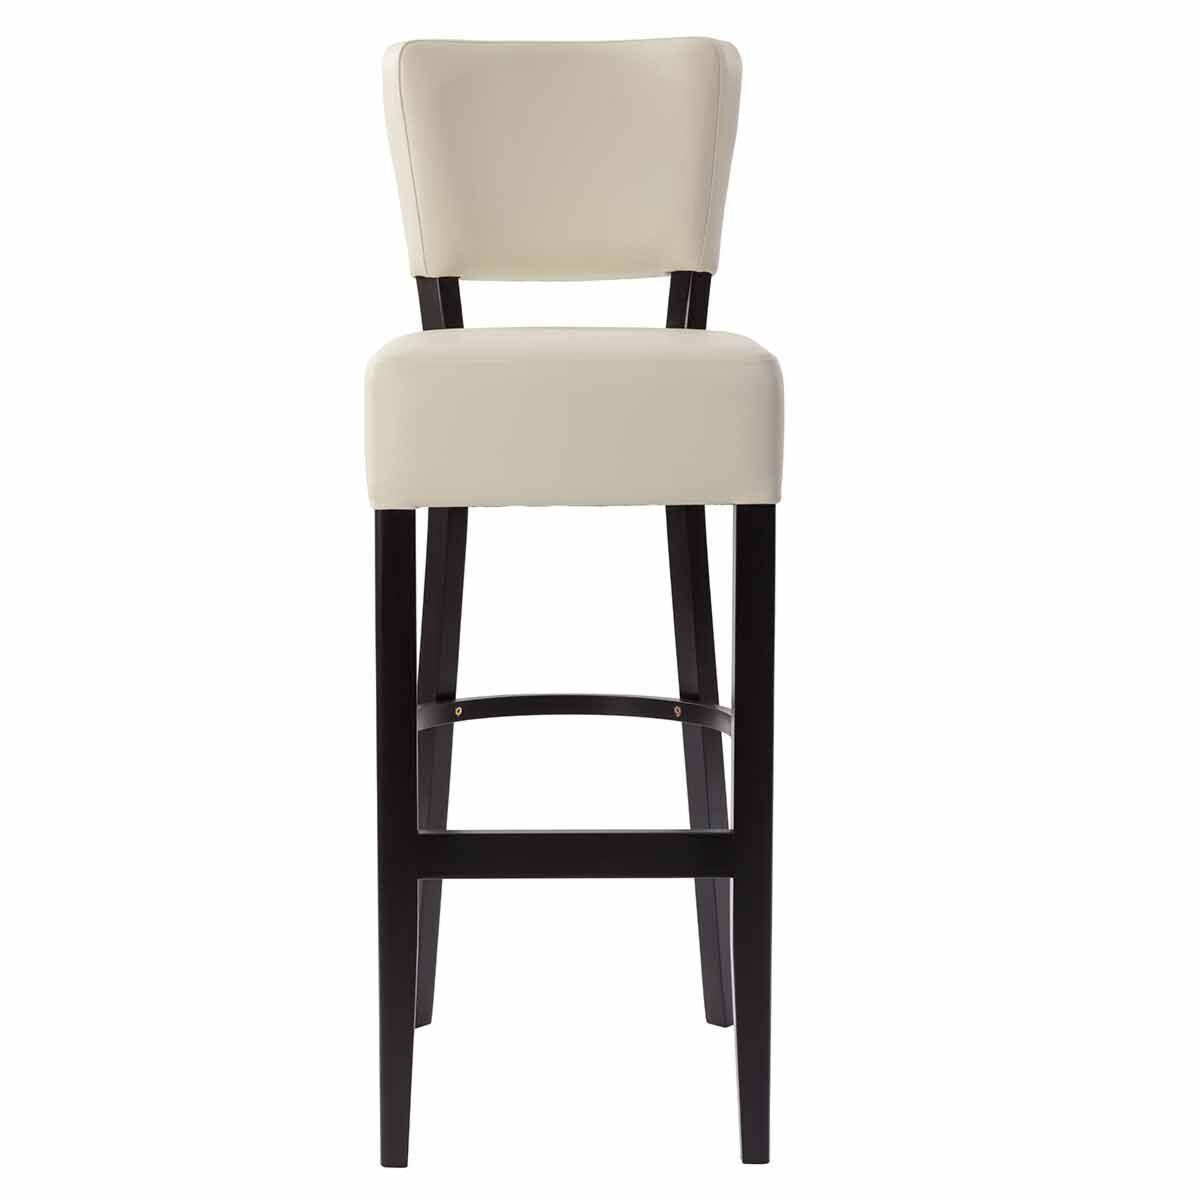 Tabilo Sena Faux Leather Bar Chair Cream